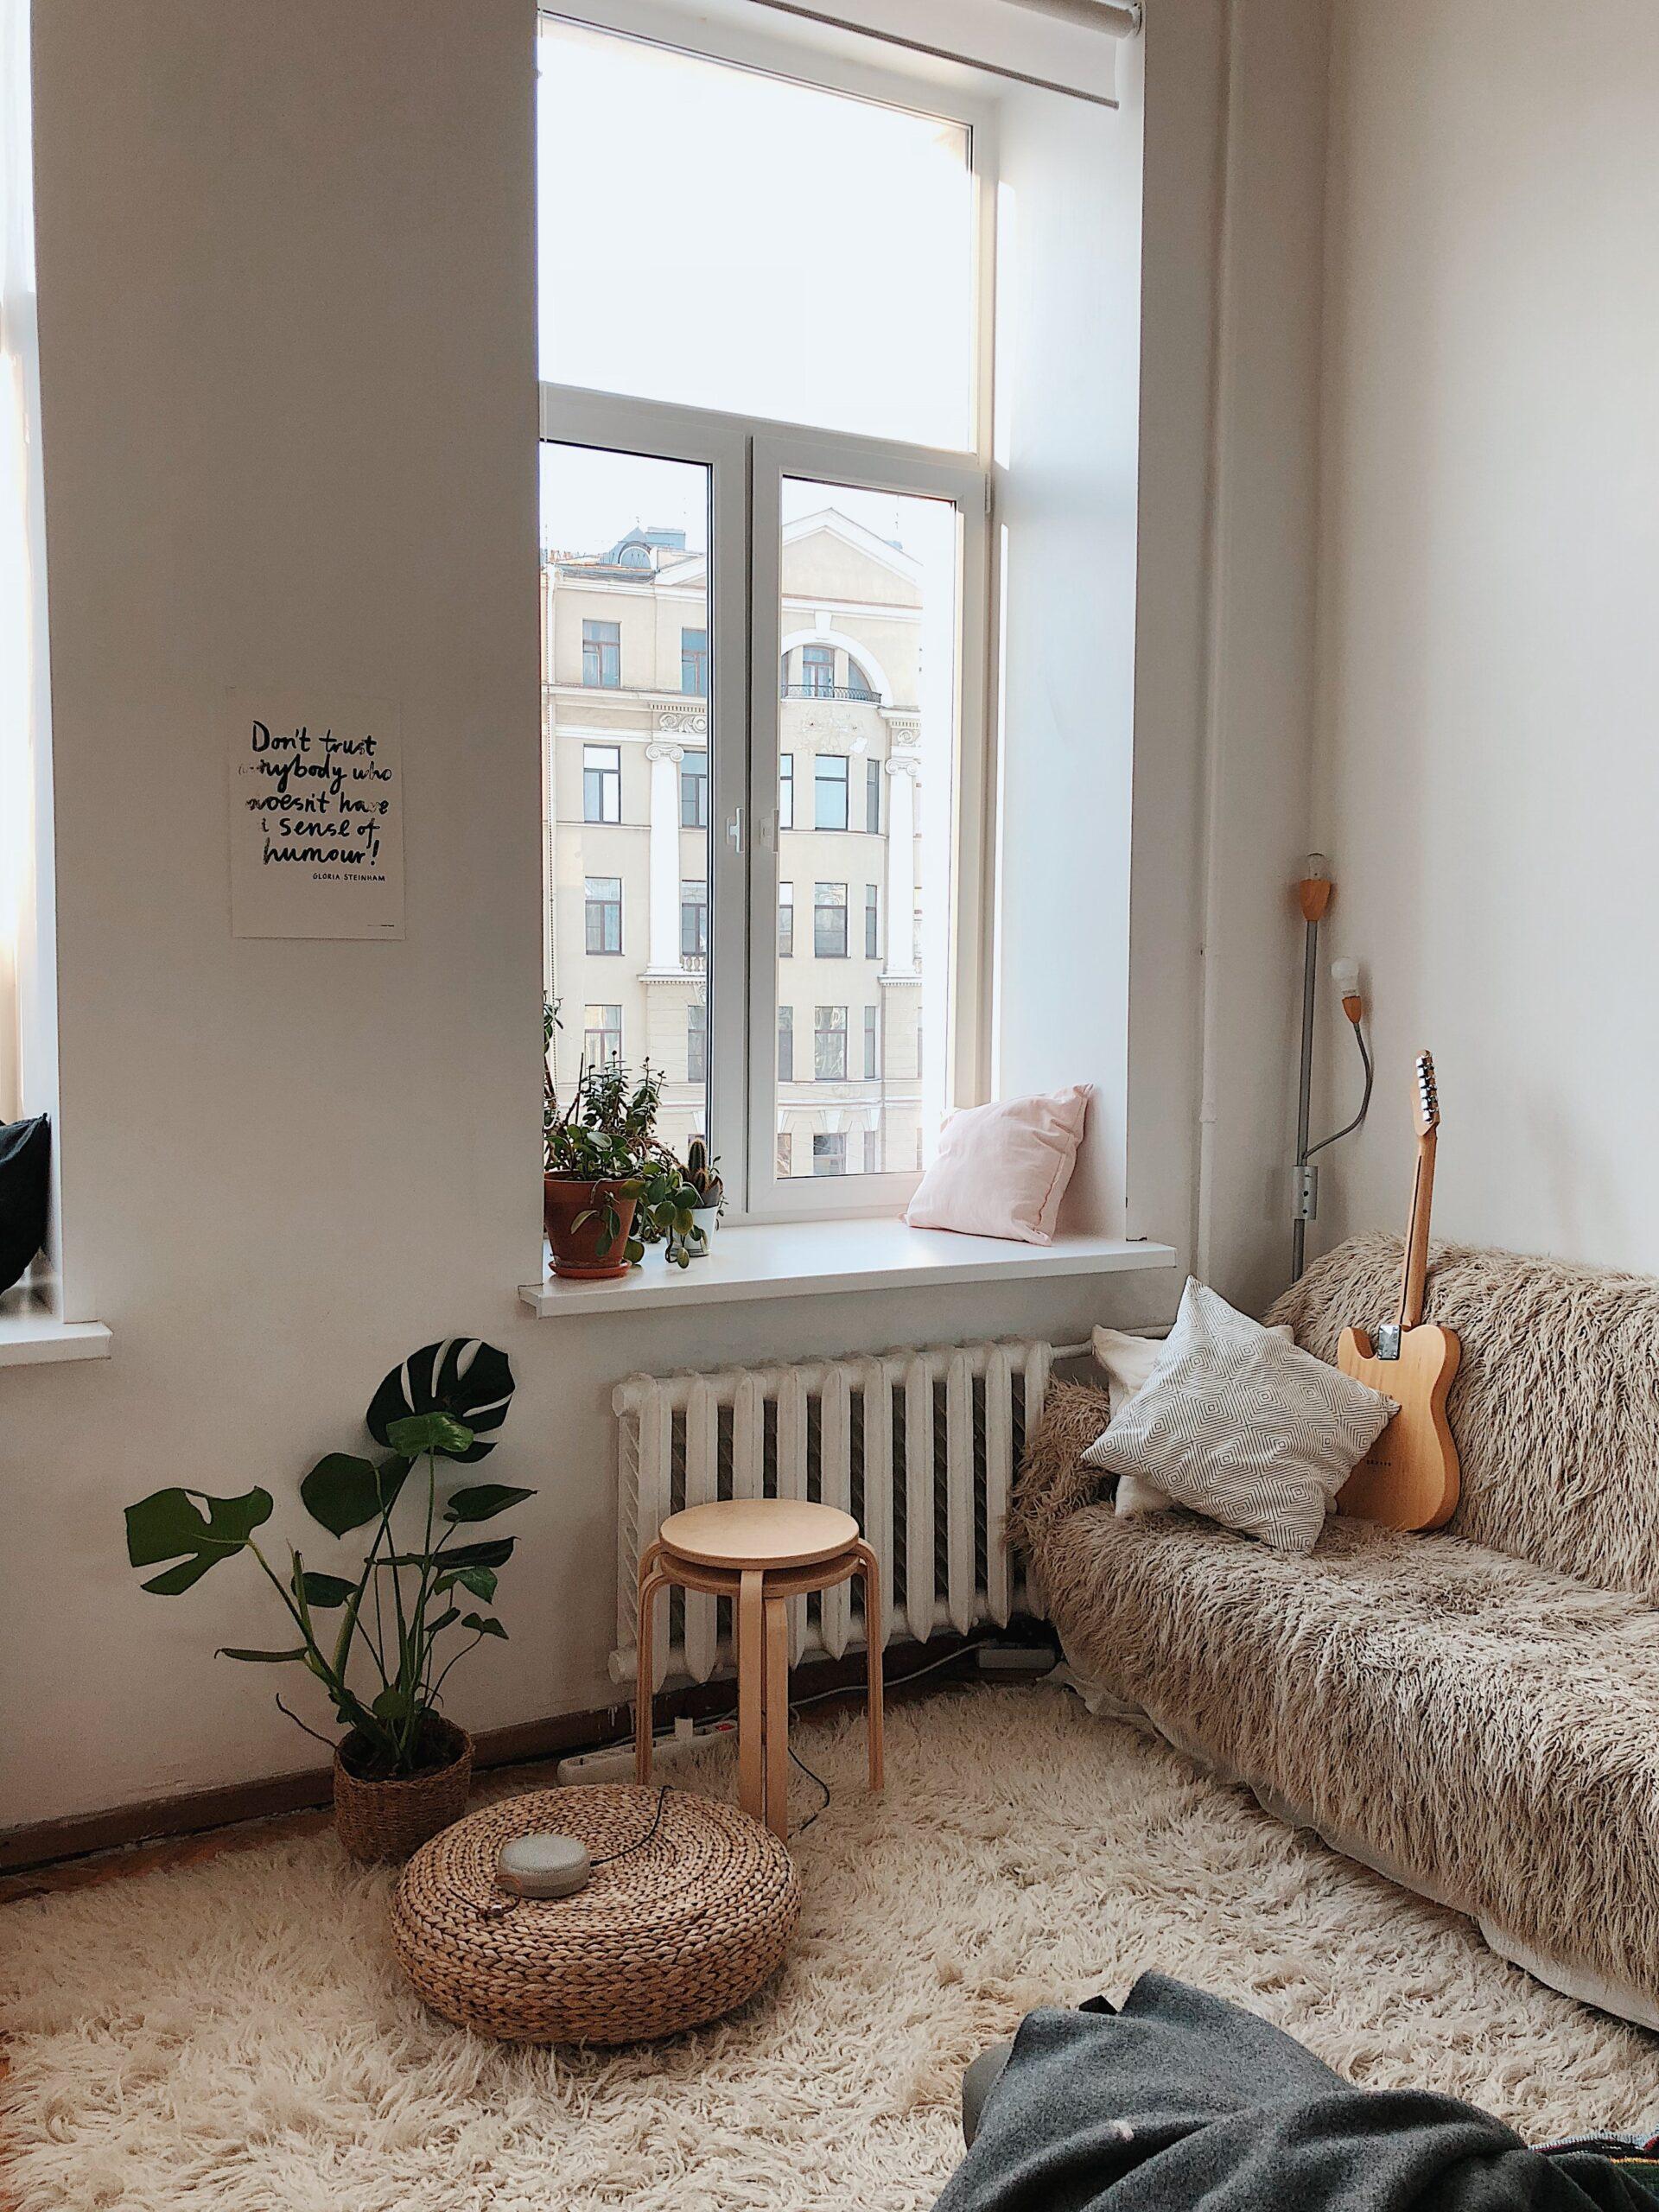 round-brown-wooden-stool-near-brown-sofa-892618